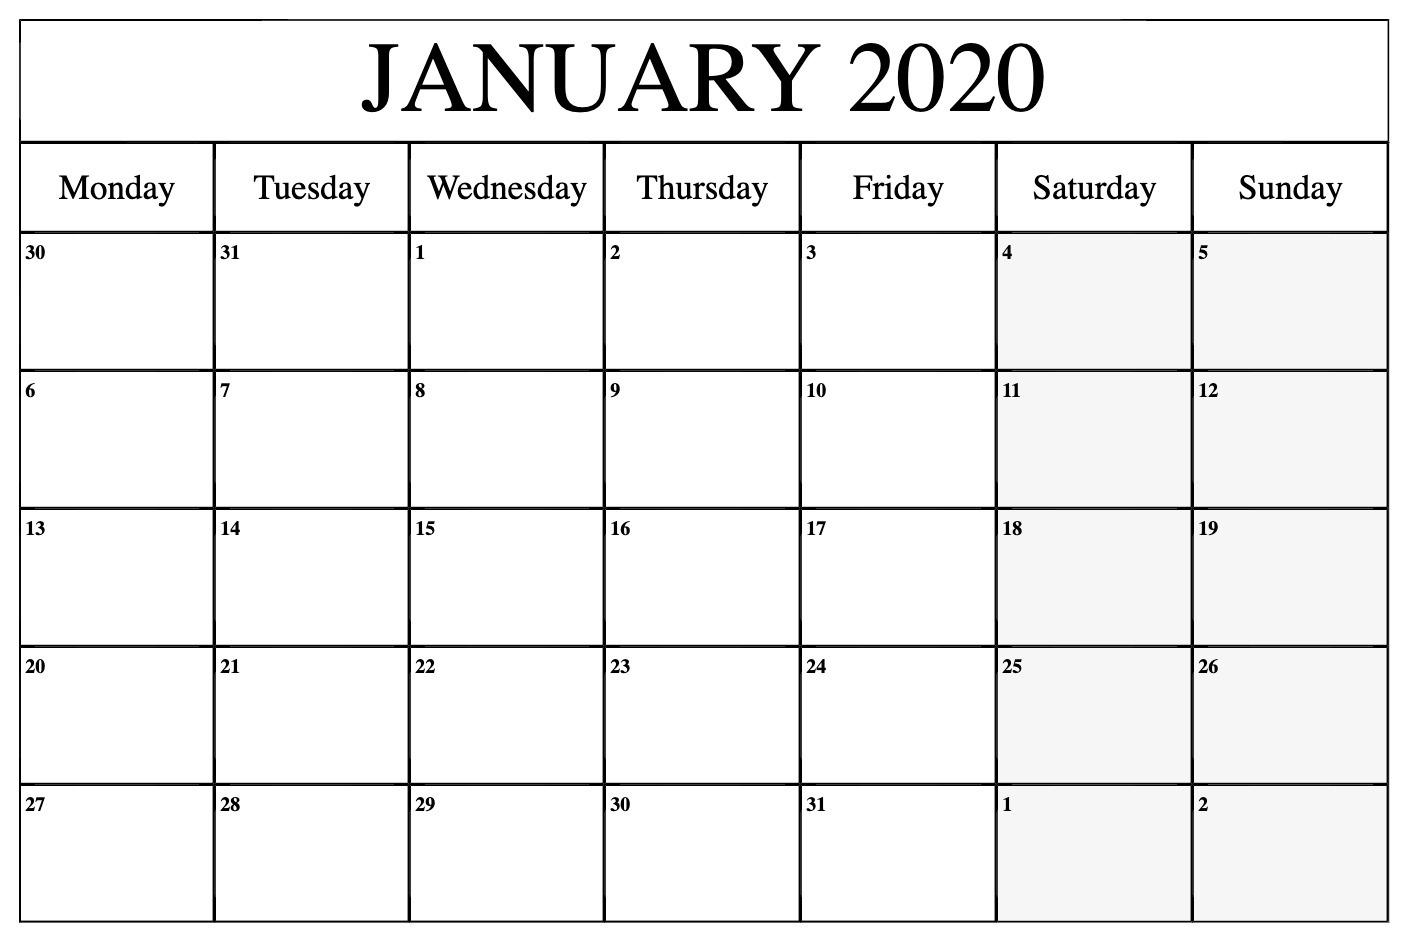 January 2020 Calendar Printable Template In Pdf Word Excel regarding January 2020 Calendar